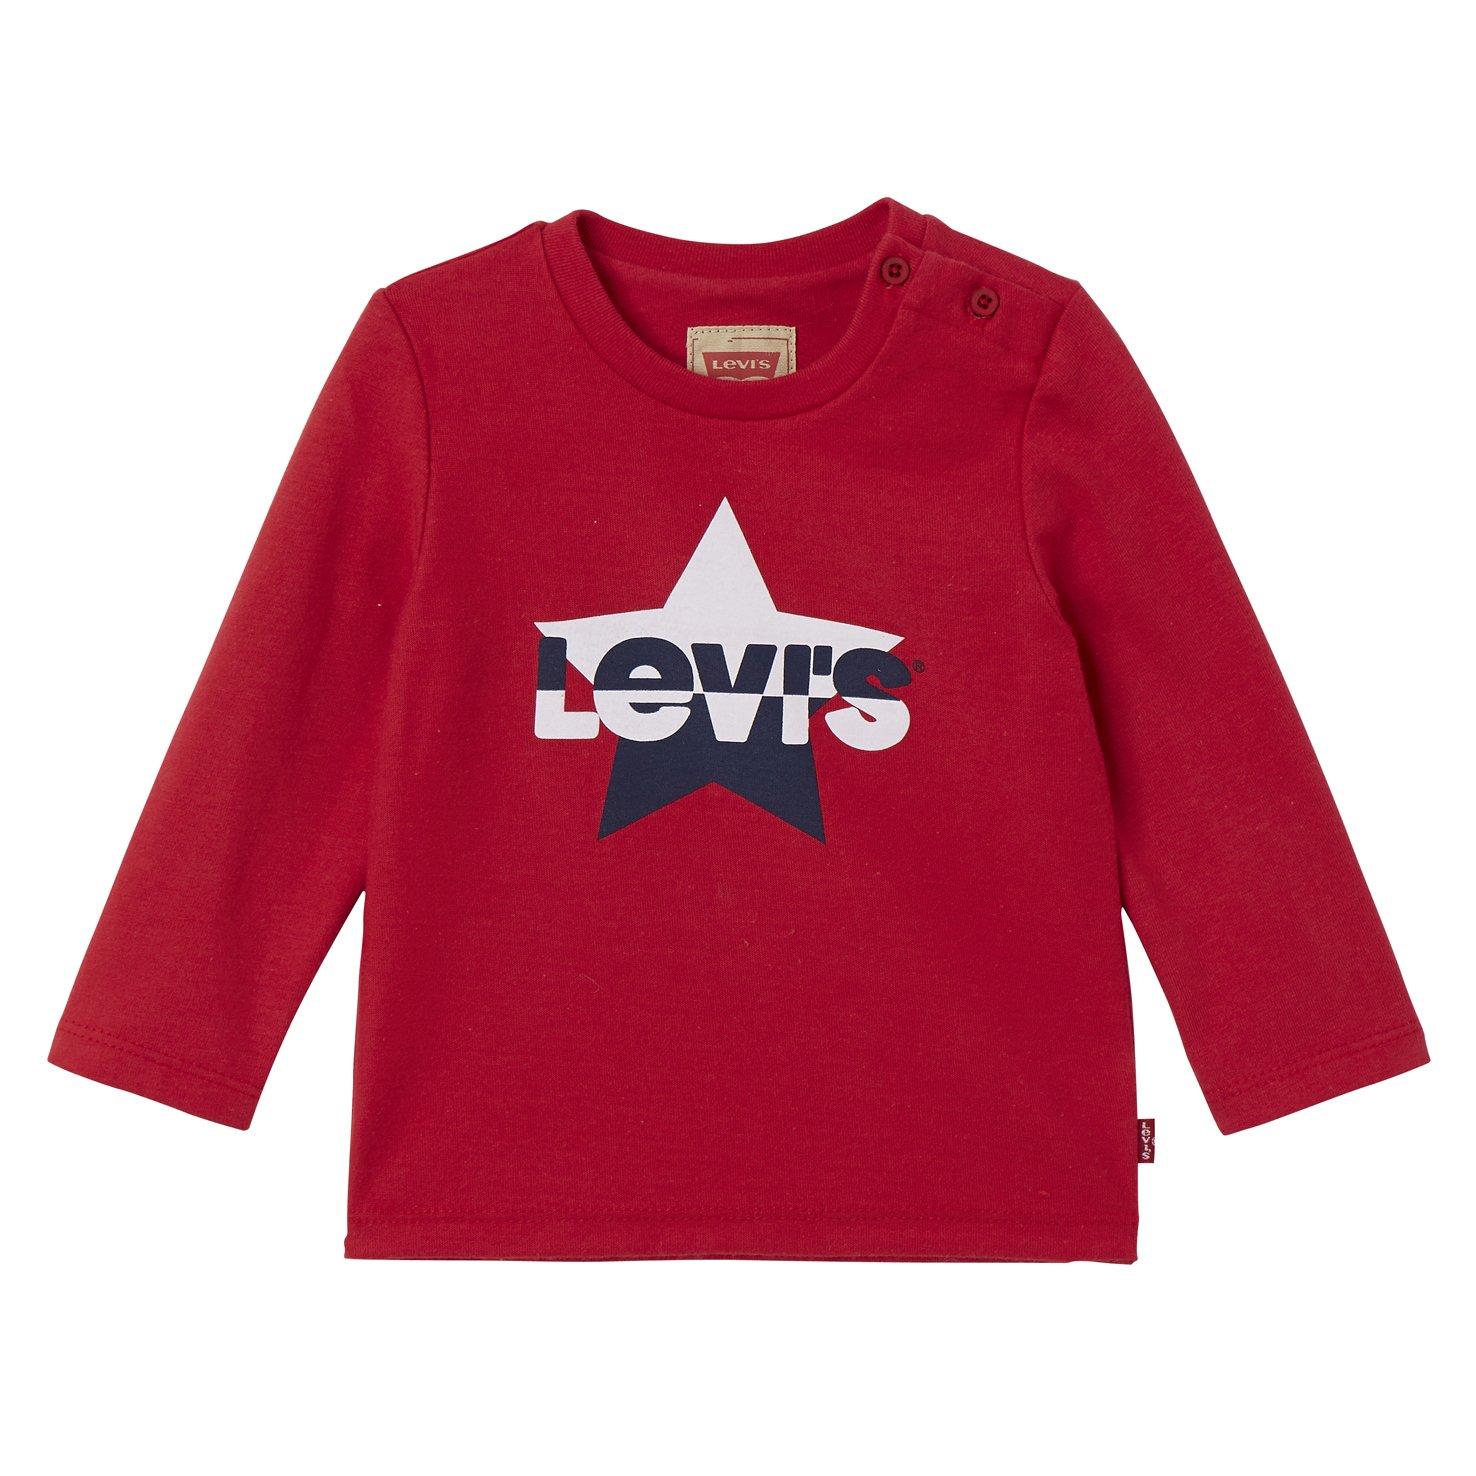 Levi's Baby Boys' Ls Tee Loy Pyjama Bottoms Levis Levi' s Kids NK10124